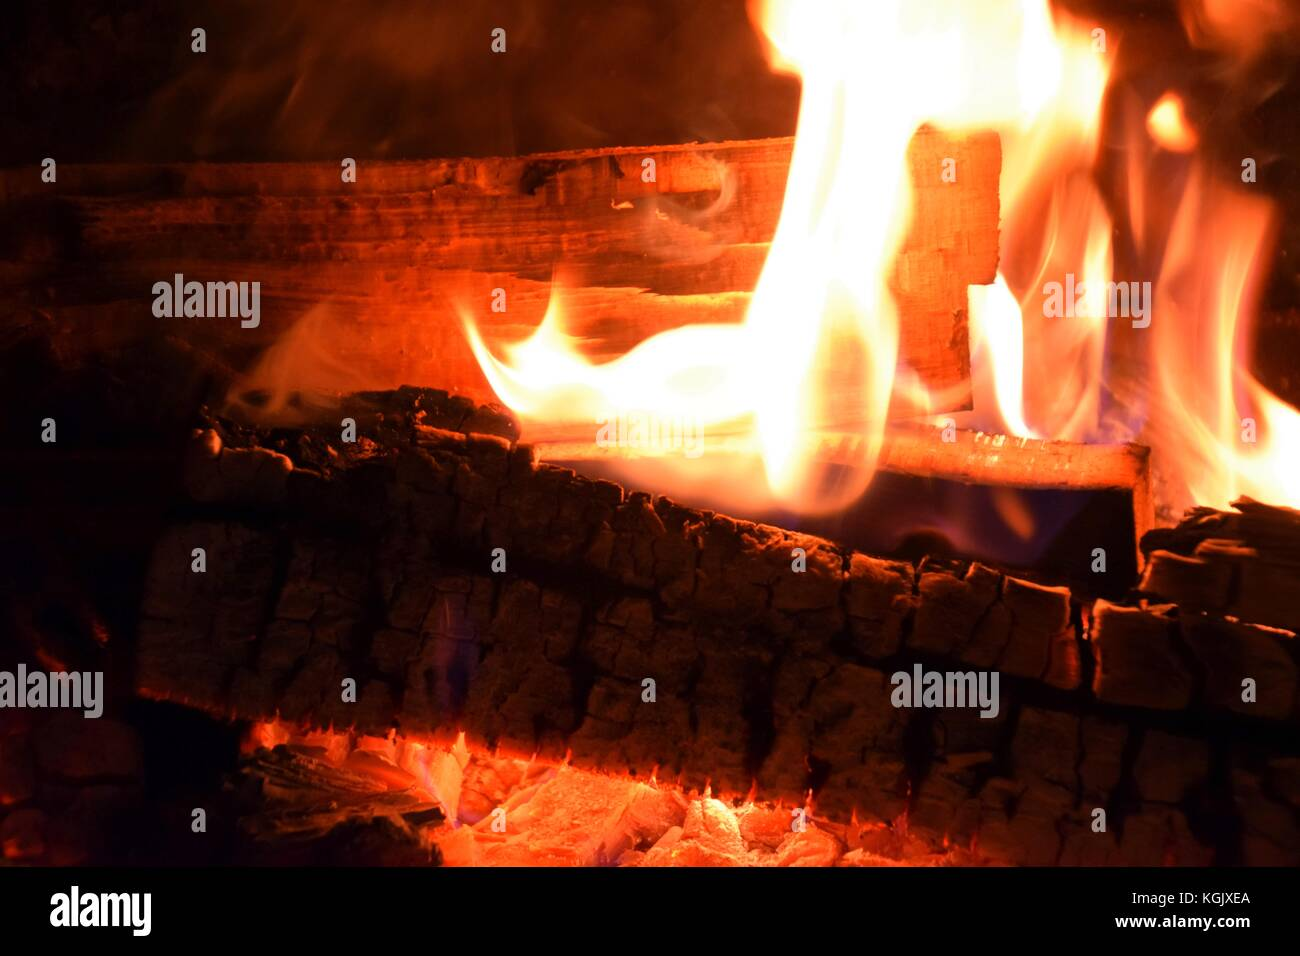 verbrennen von holz im garten | dobar metall gartenkamin a förmig